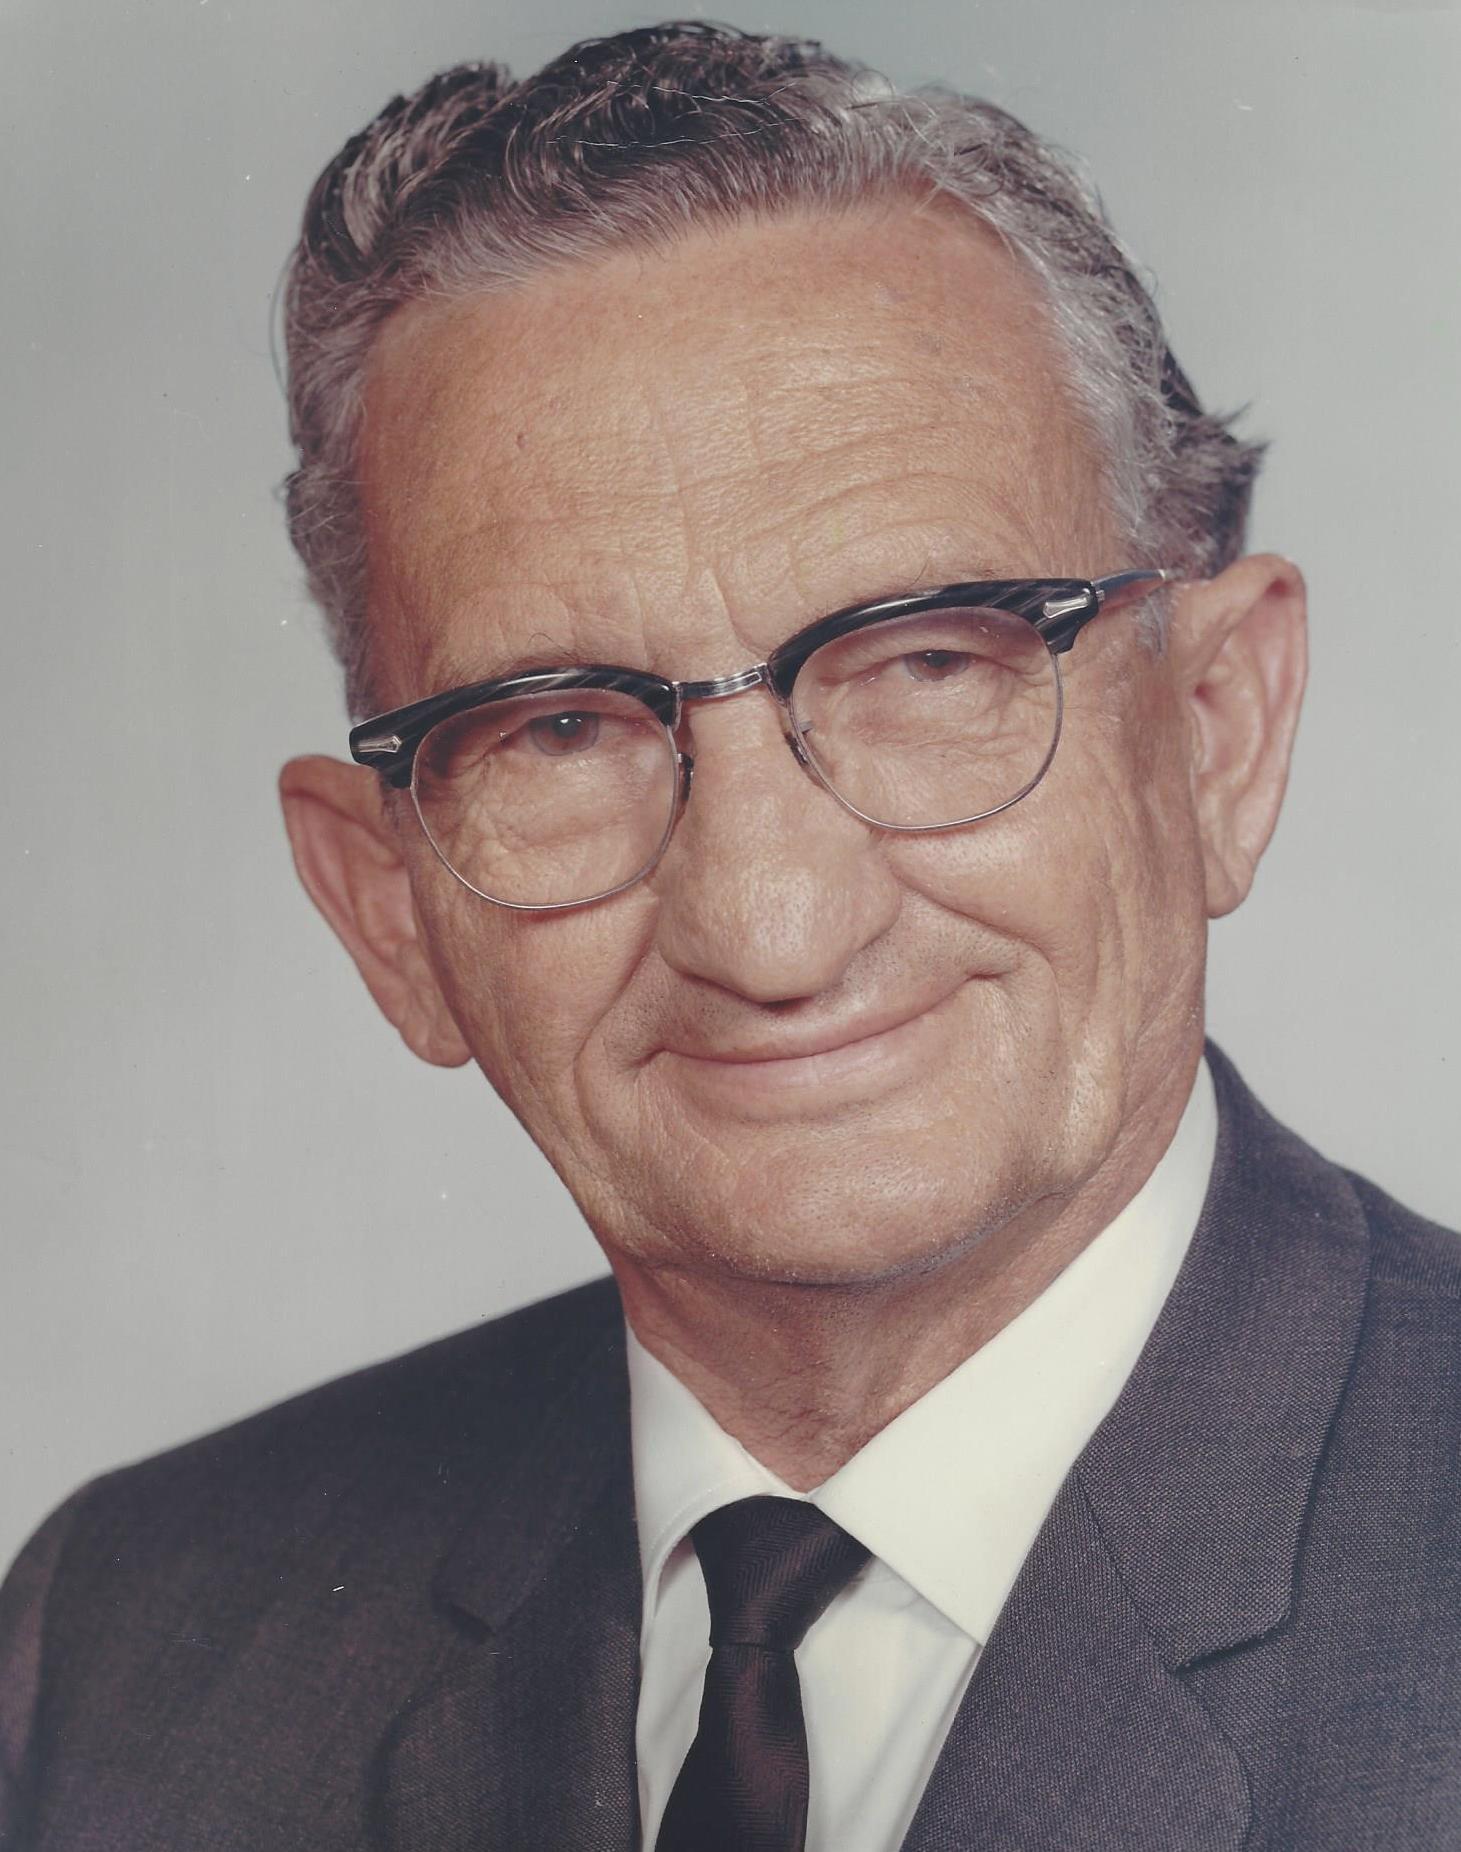 james-boardman-hawthorne-1960s-profile